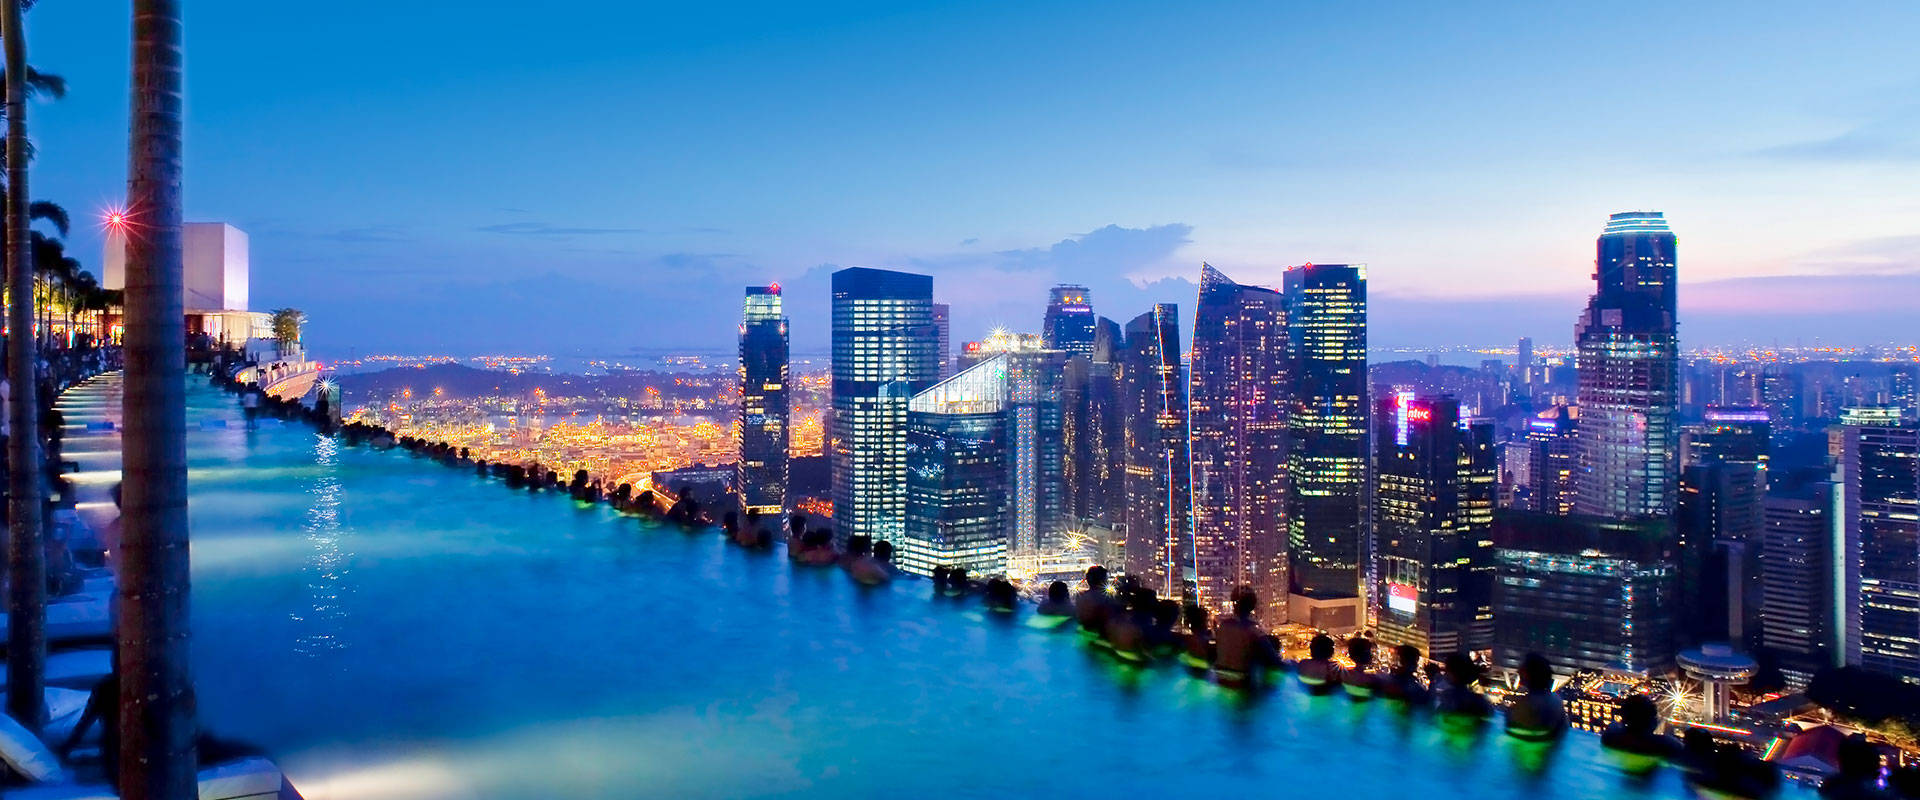 Marina bay sands singapore skyline view aglaia - Singapur skyline pool ...